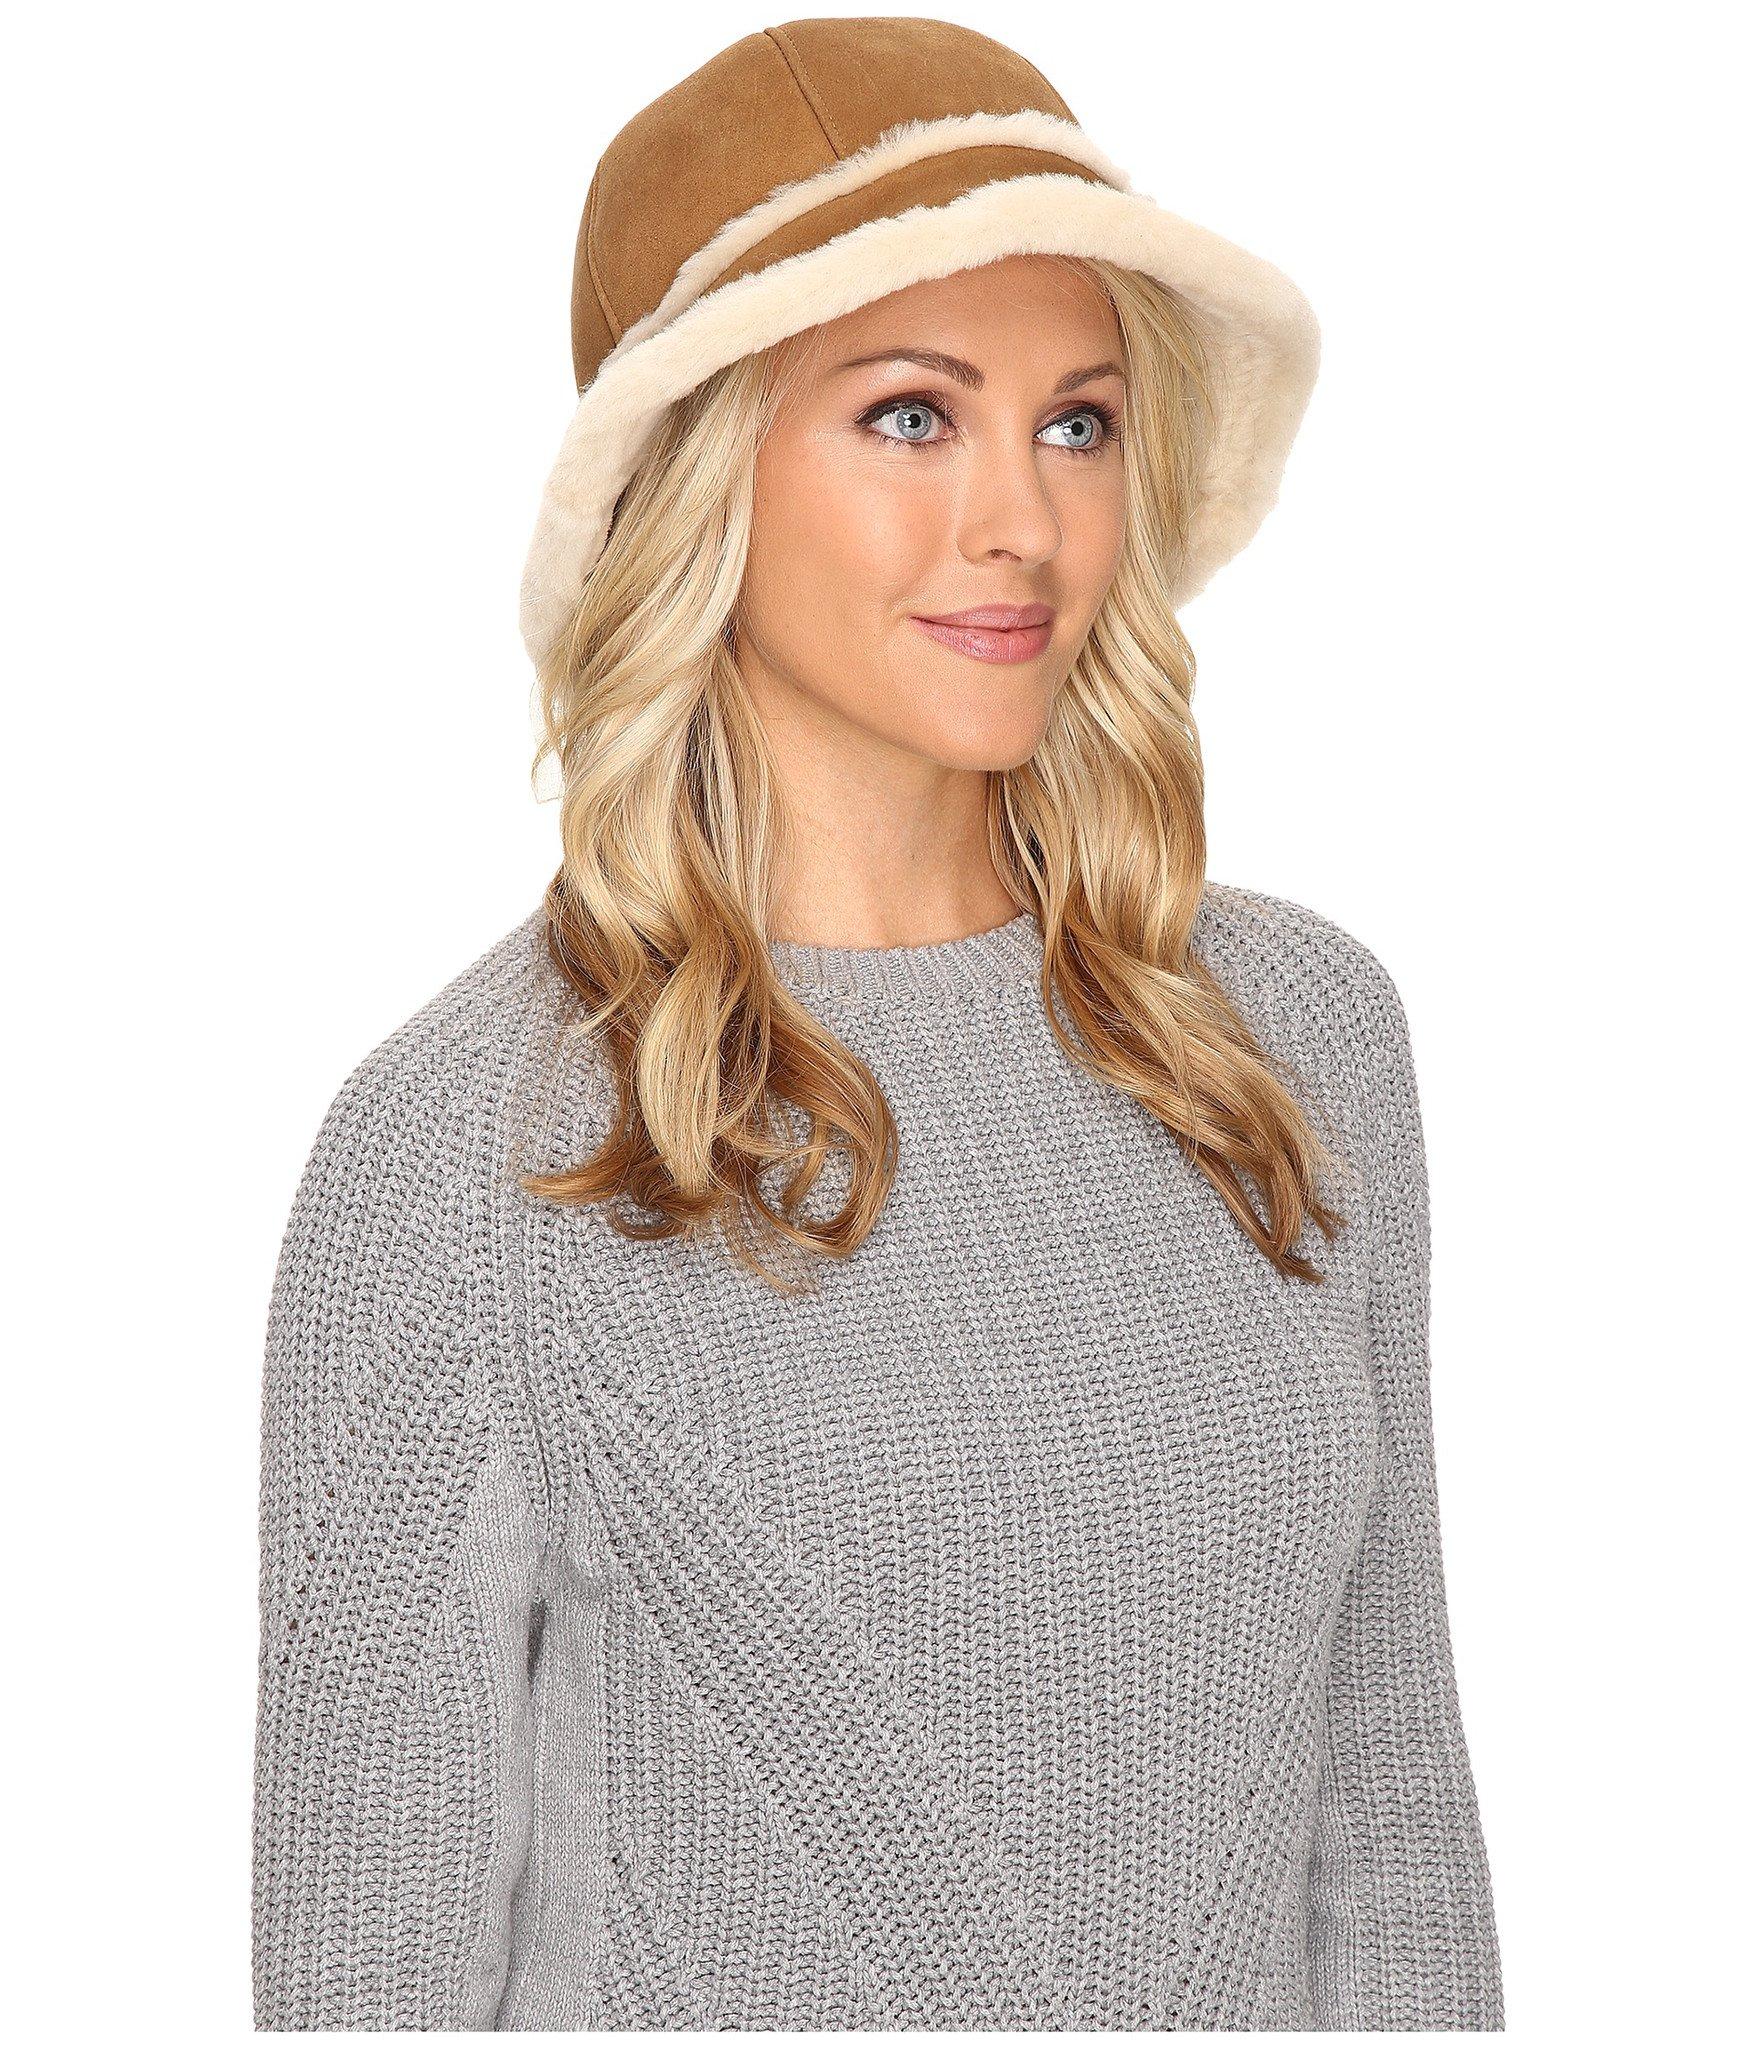 UGG Women's Sheepskin City Bucket Hat Chestnut Hat One Size